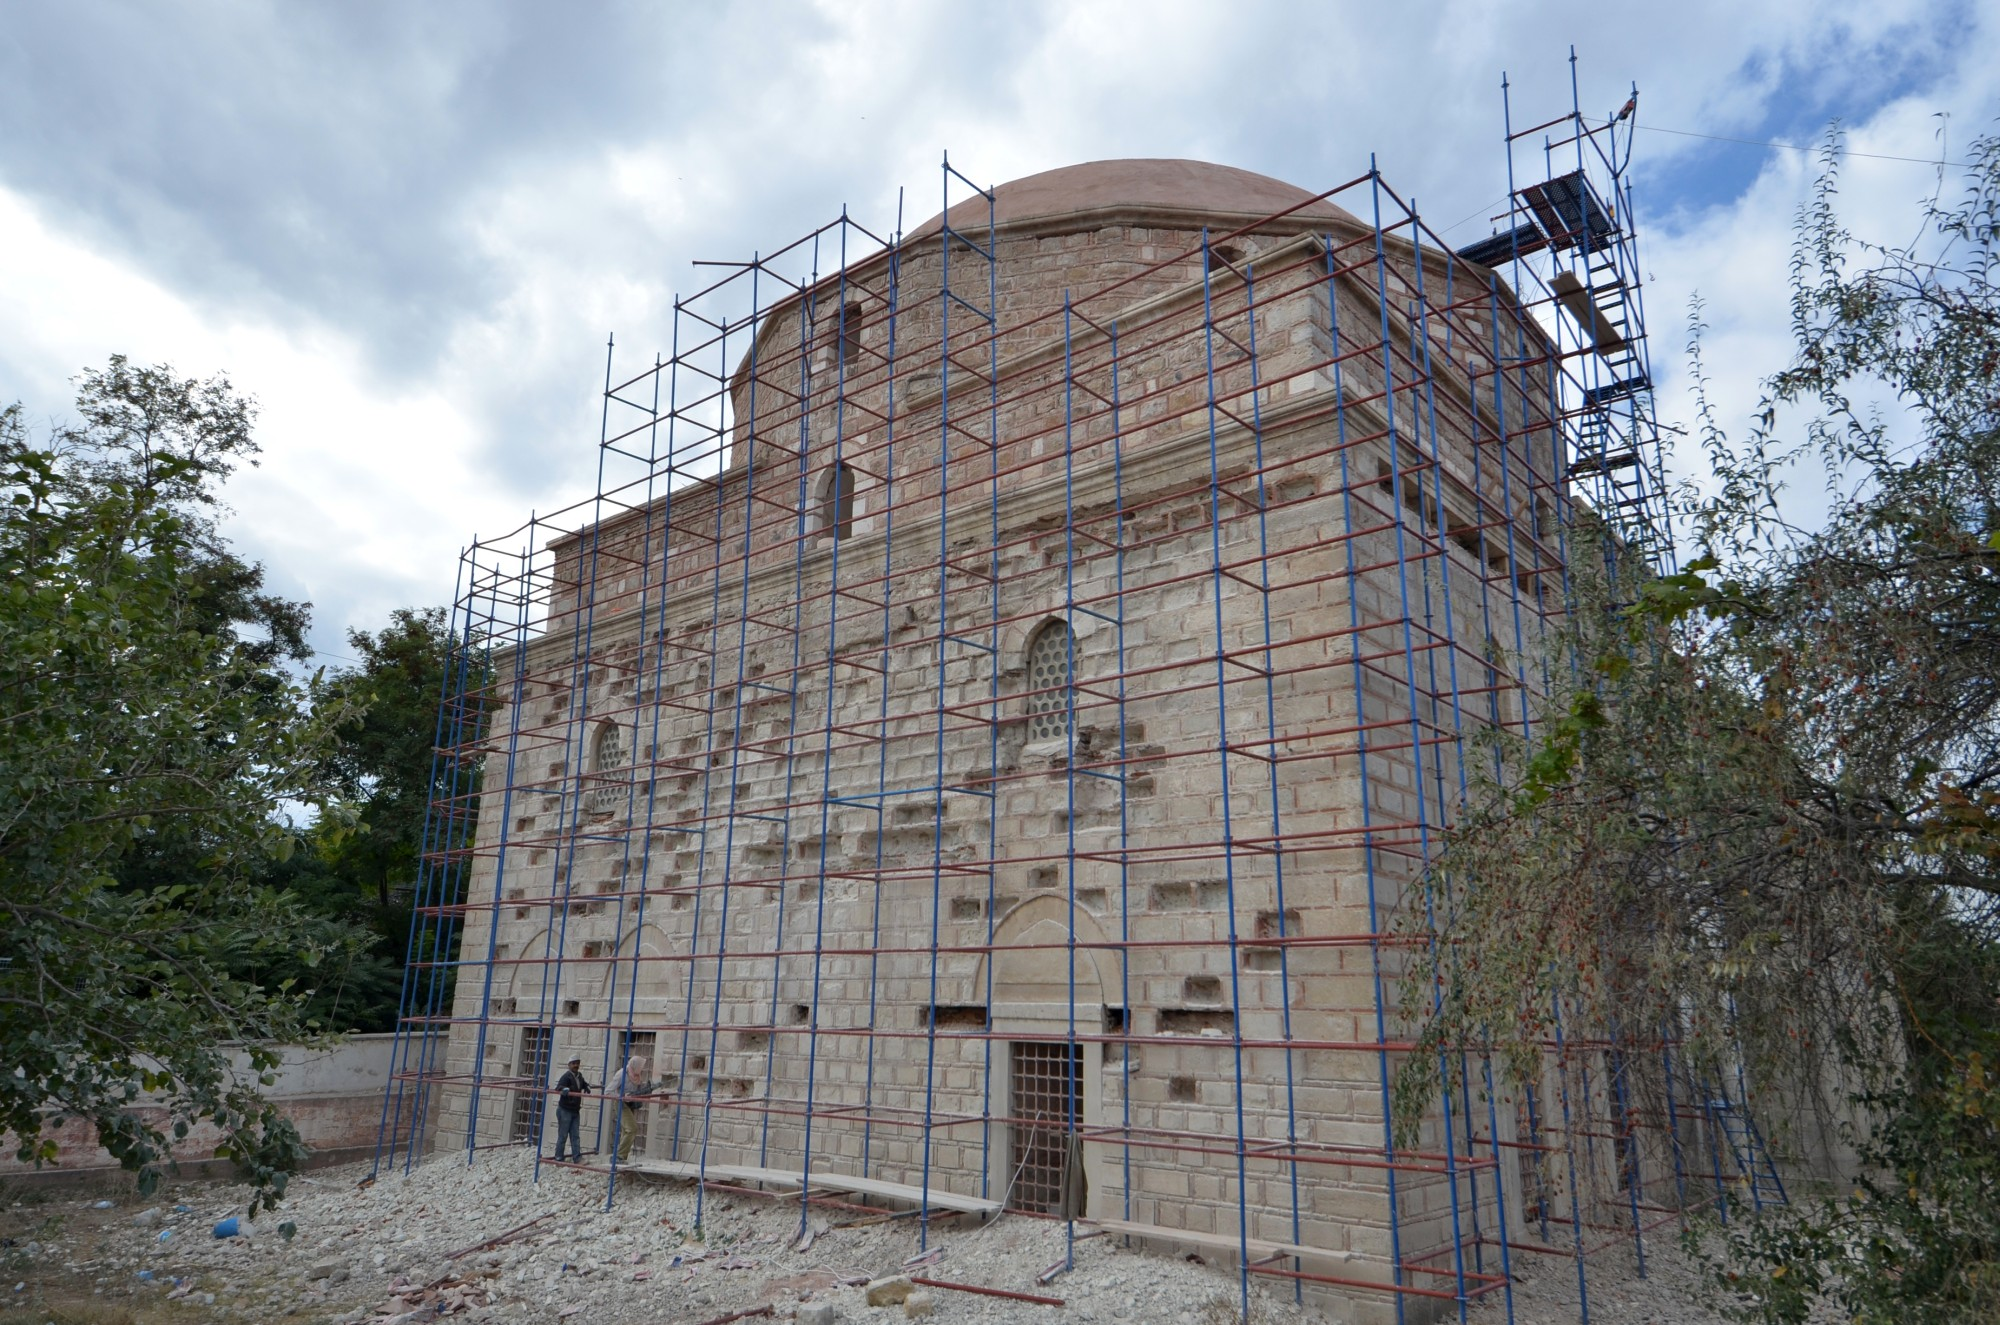 Beylerbeyi Suleyman Pasha Mosque in Edirne during the renovation in 2013